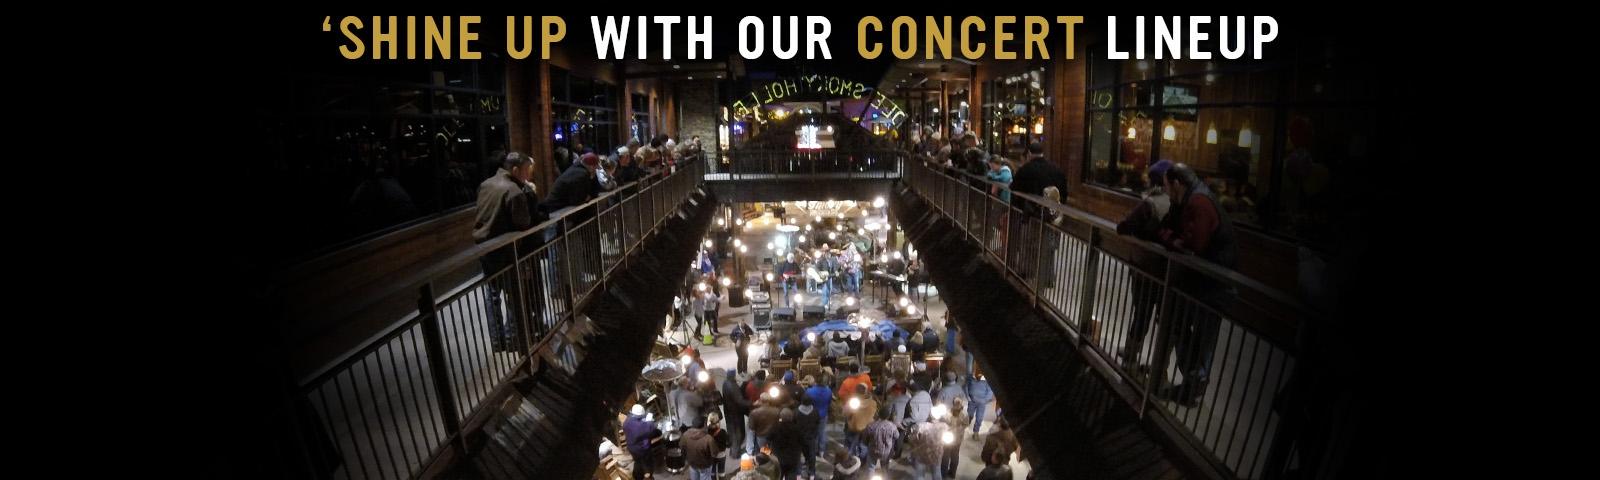 OSM Concert Series